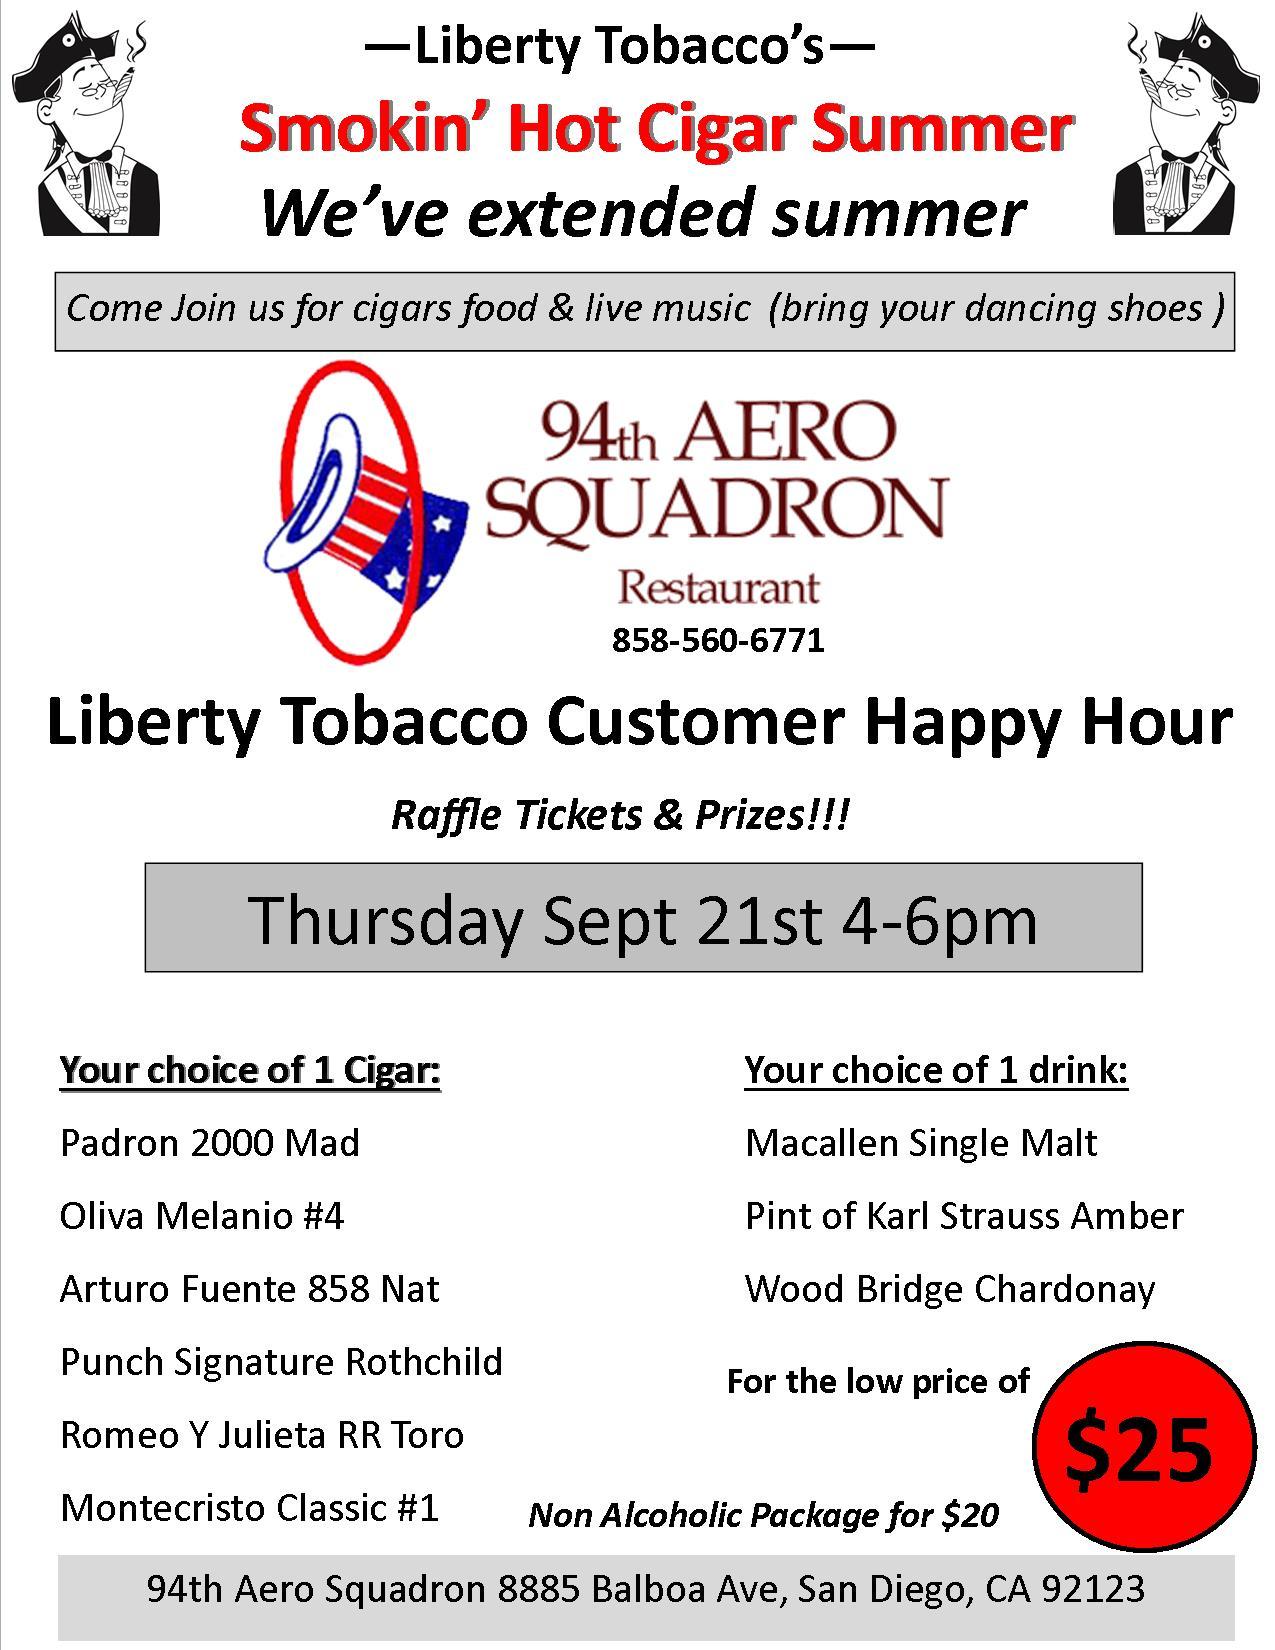 Liberty Tobacco Happy Hour at 94th Aero coming soon!!!